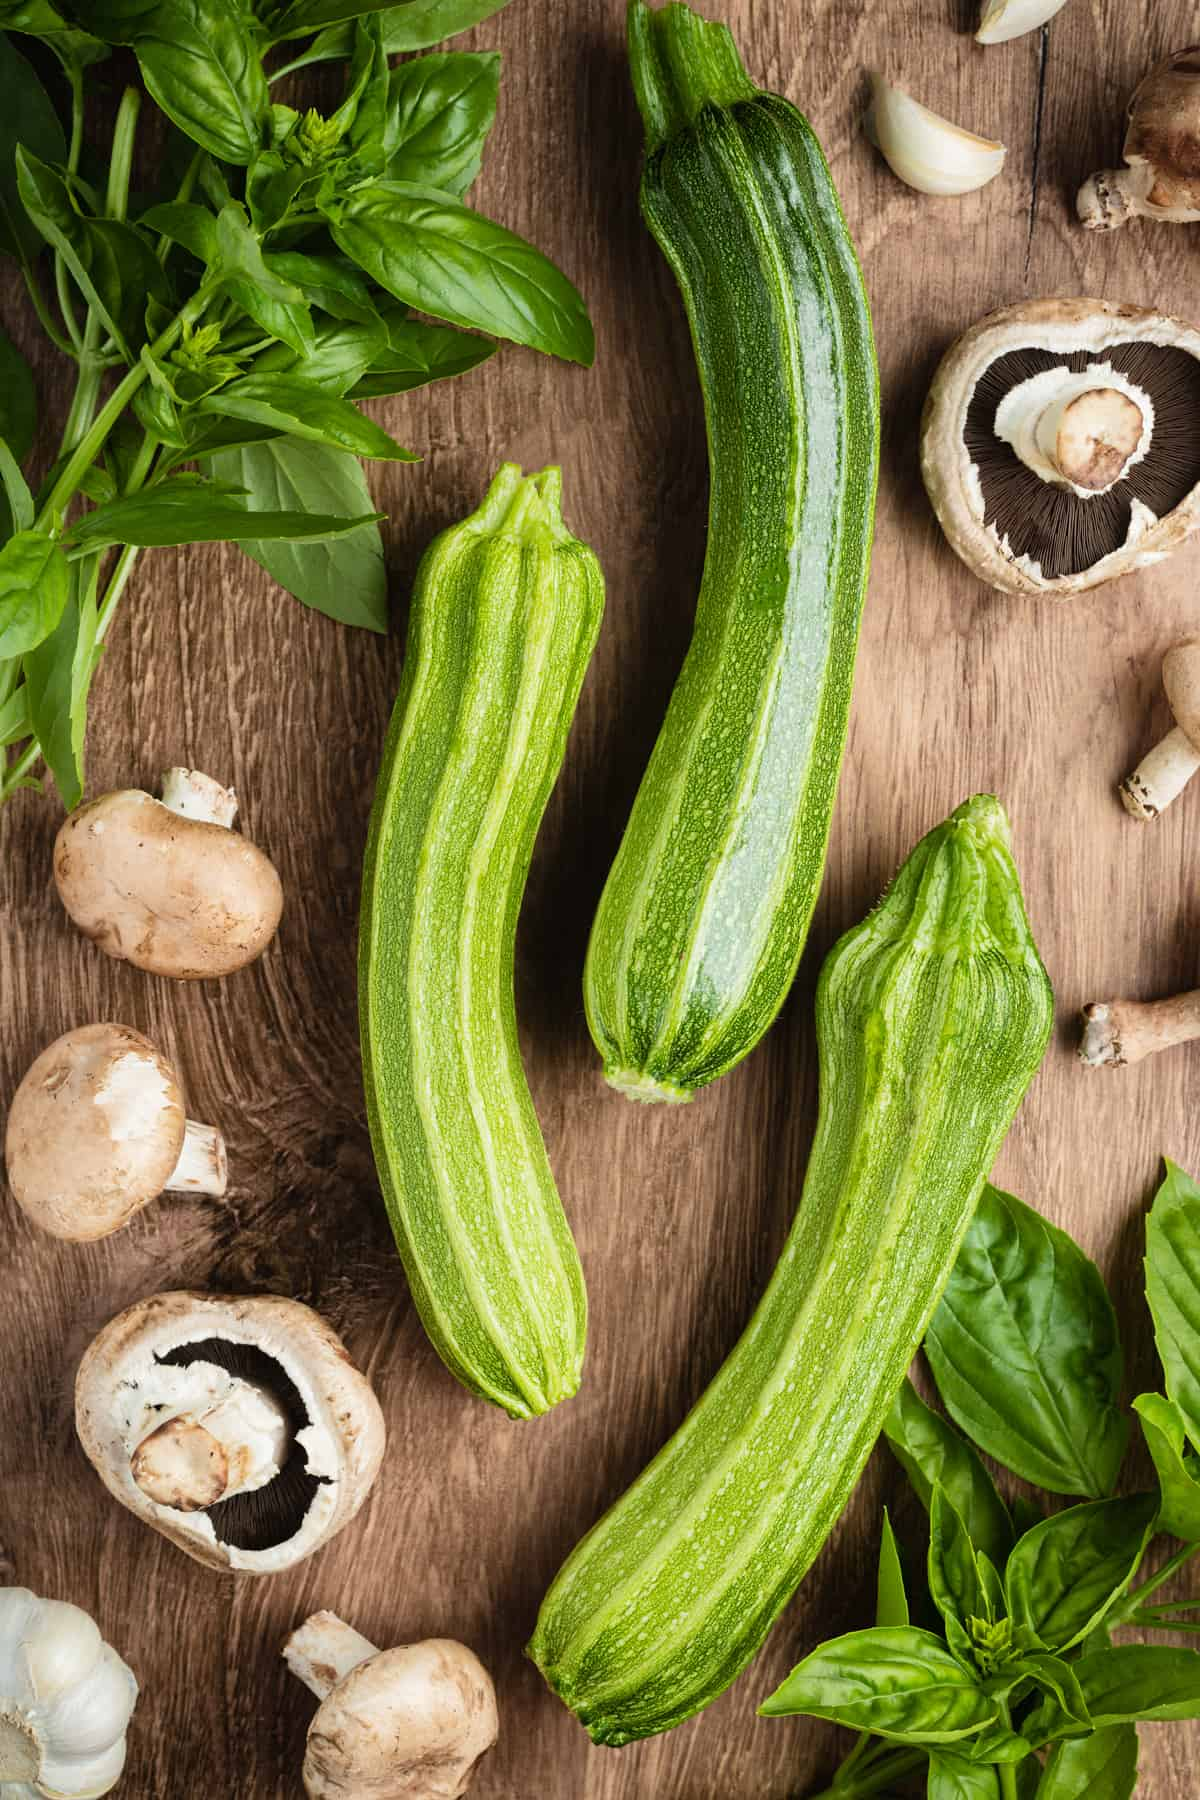 mushrooms, zucchini and basil